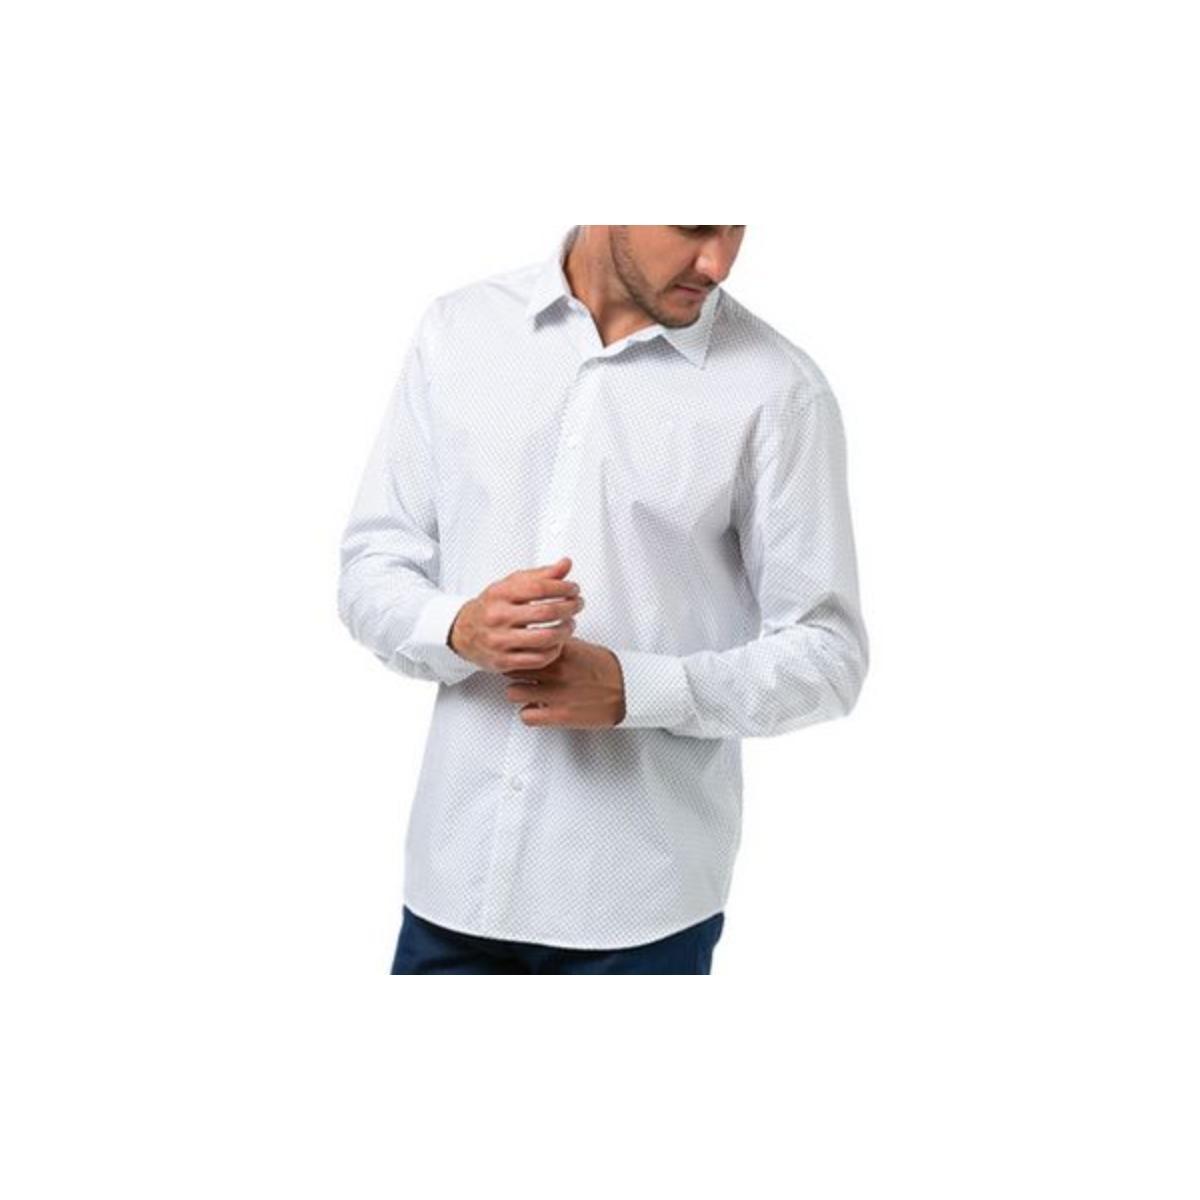 Camisa Masculina Forum 314602959 Branco/azul